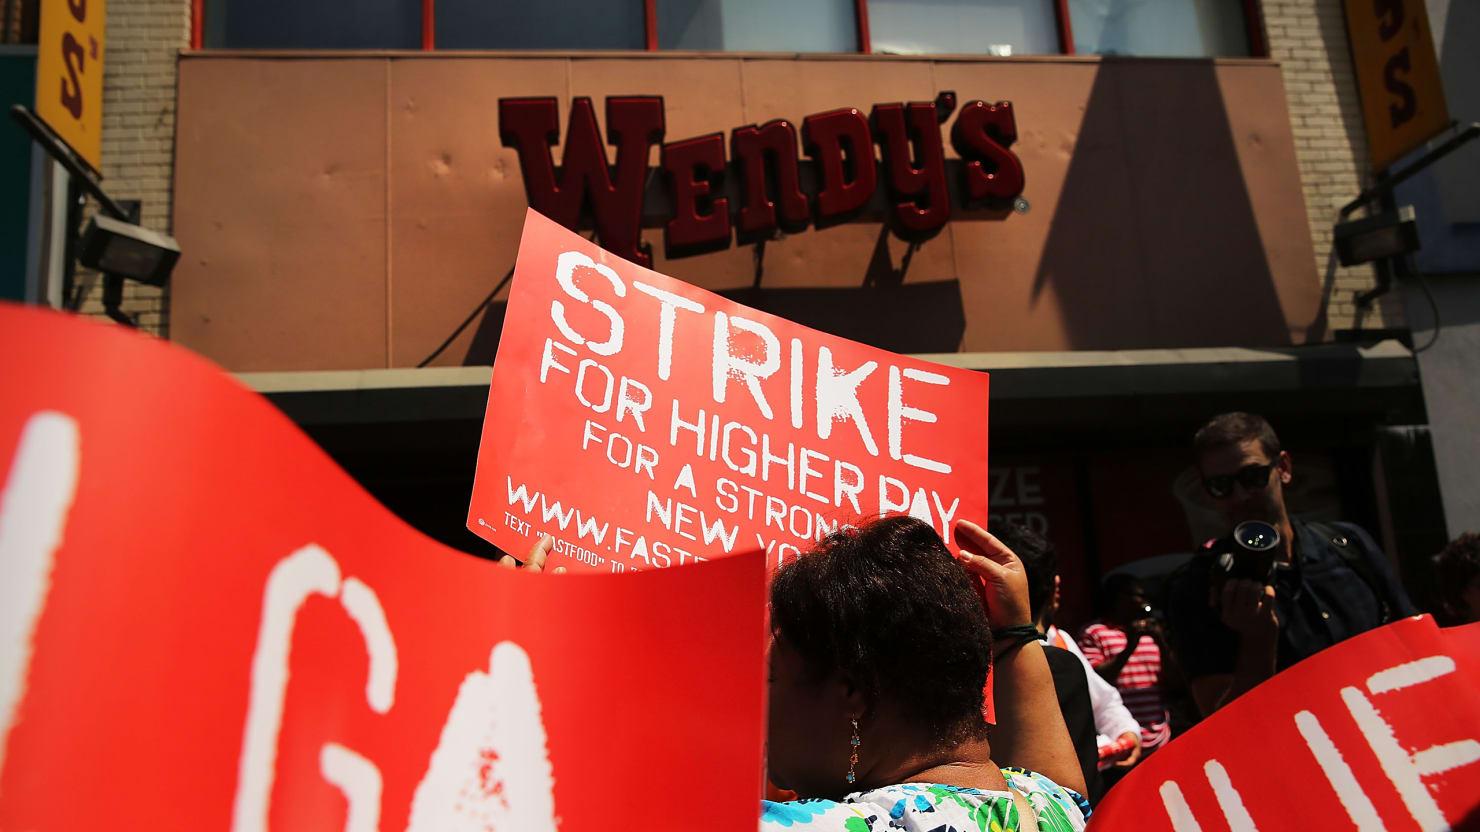 Fast Food Chains Cheap Labor